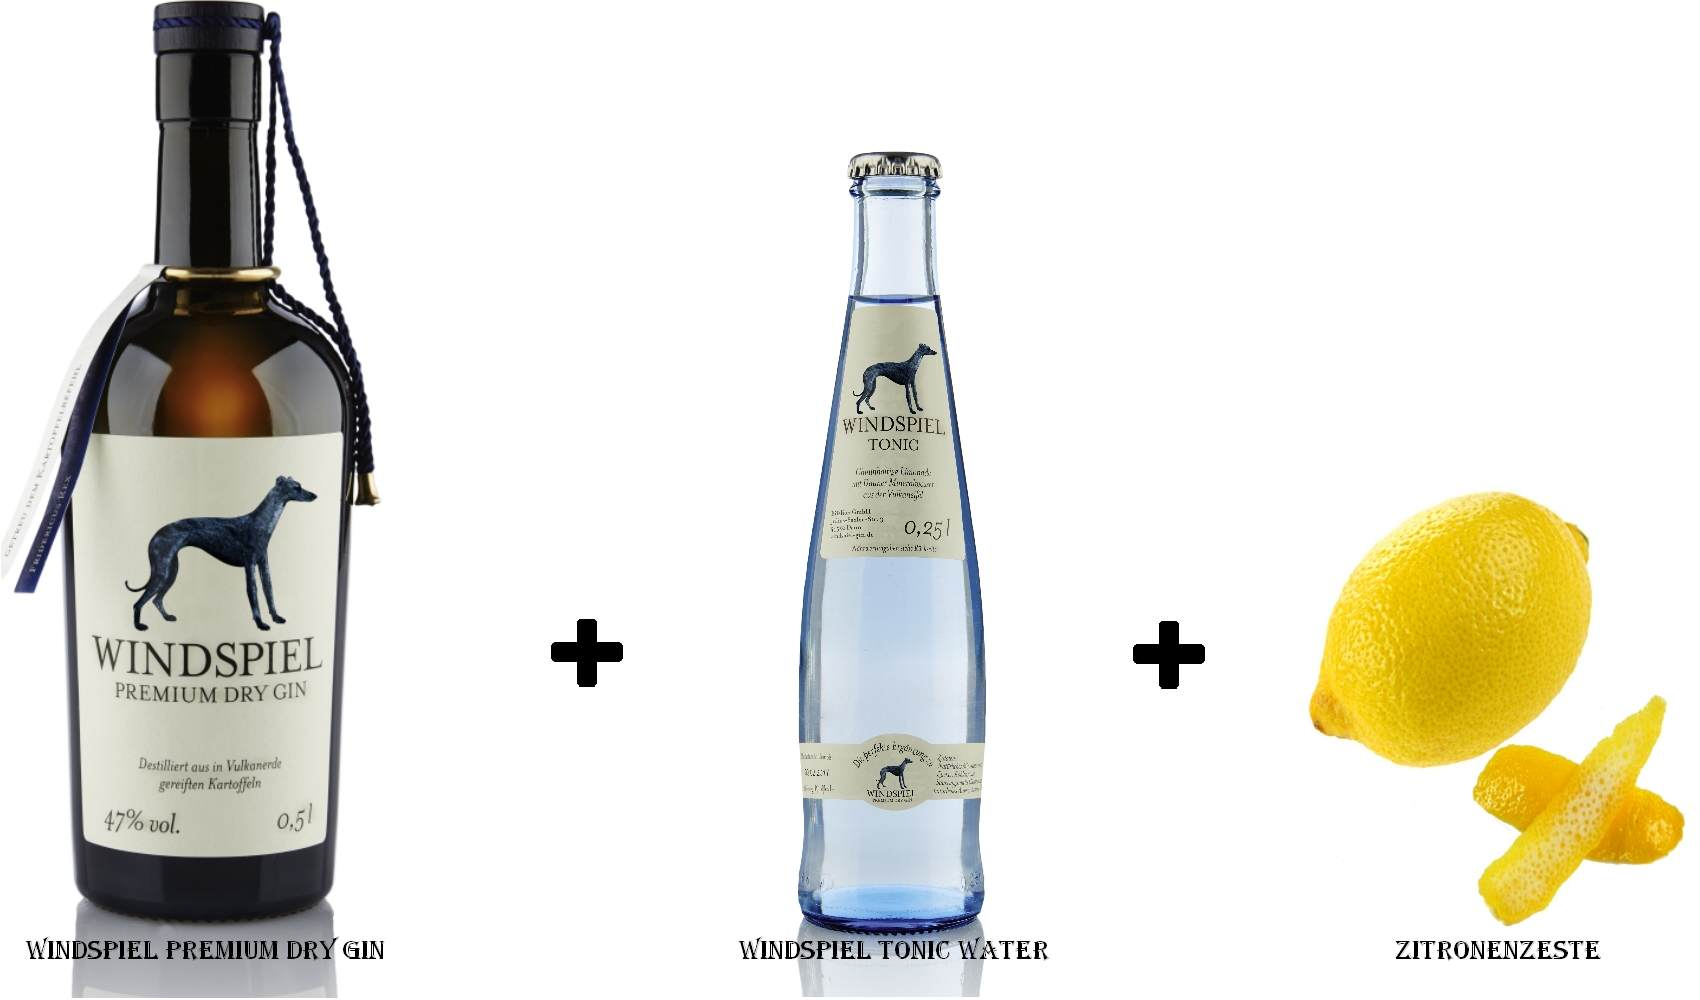 Windspiel Premium Dry Gin + Windspiel Tonic Water + Zitronenzeste